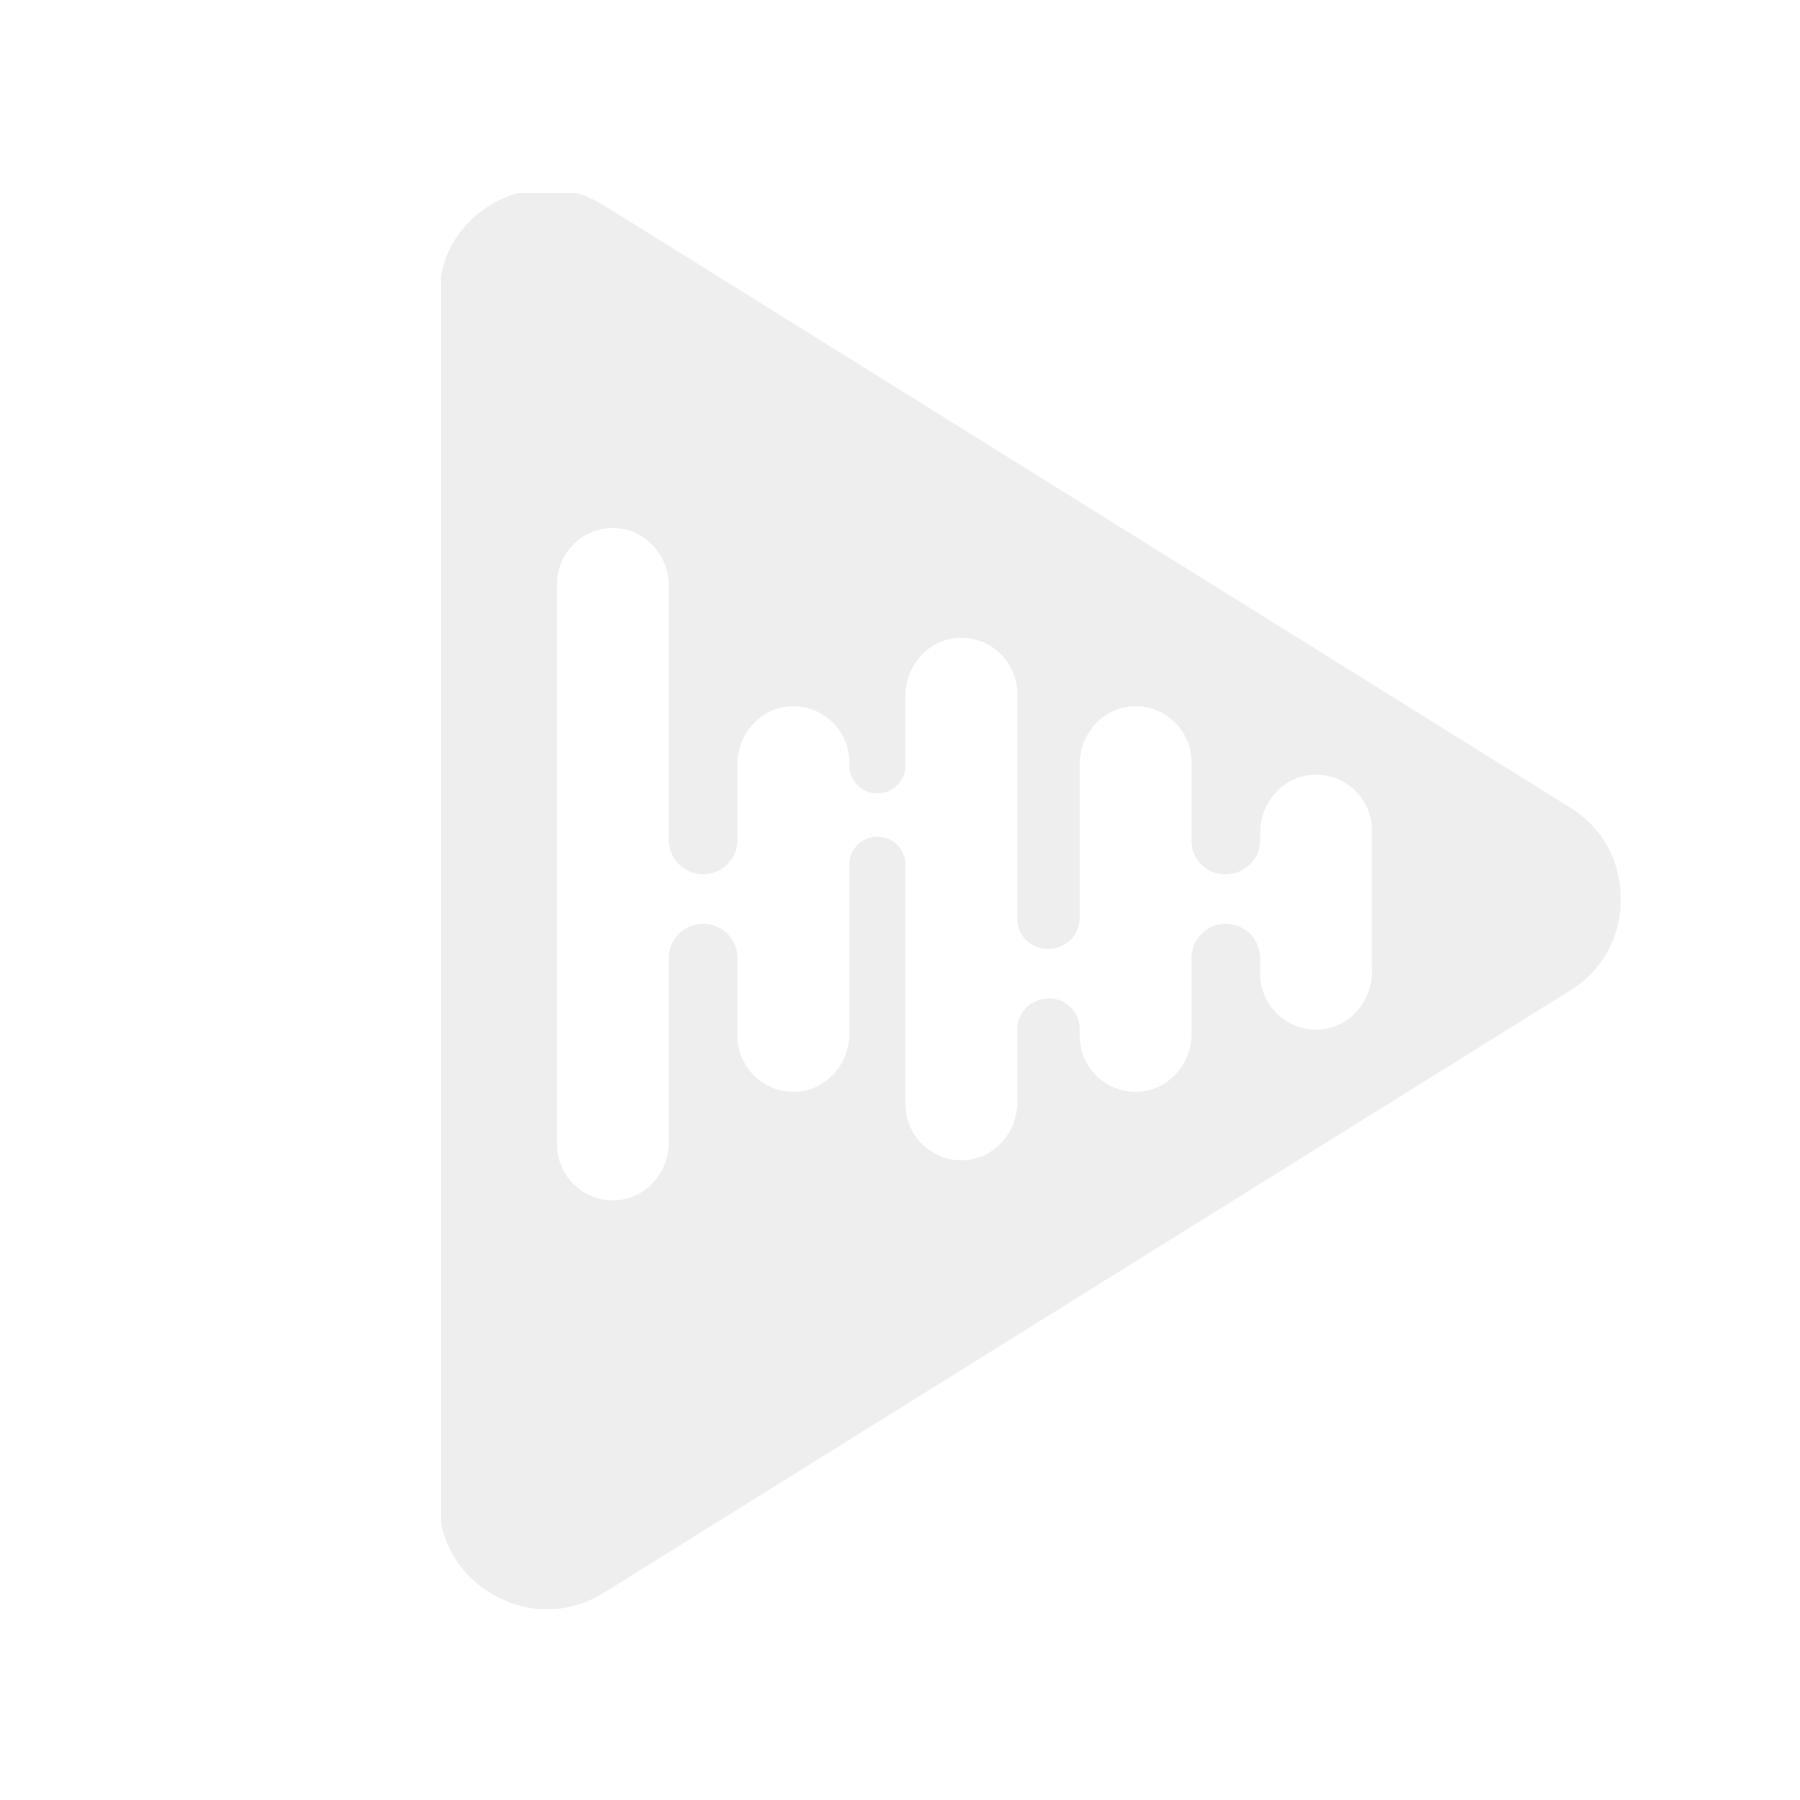 Audison APBMW-F52-HIFI